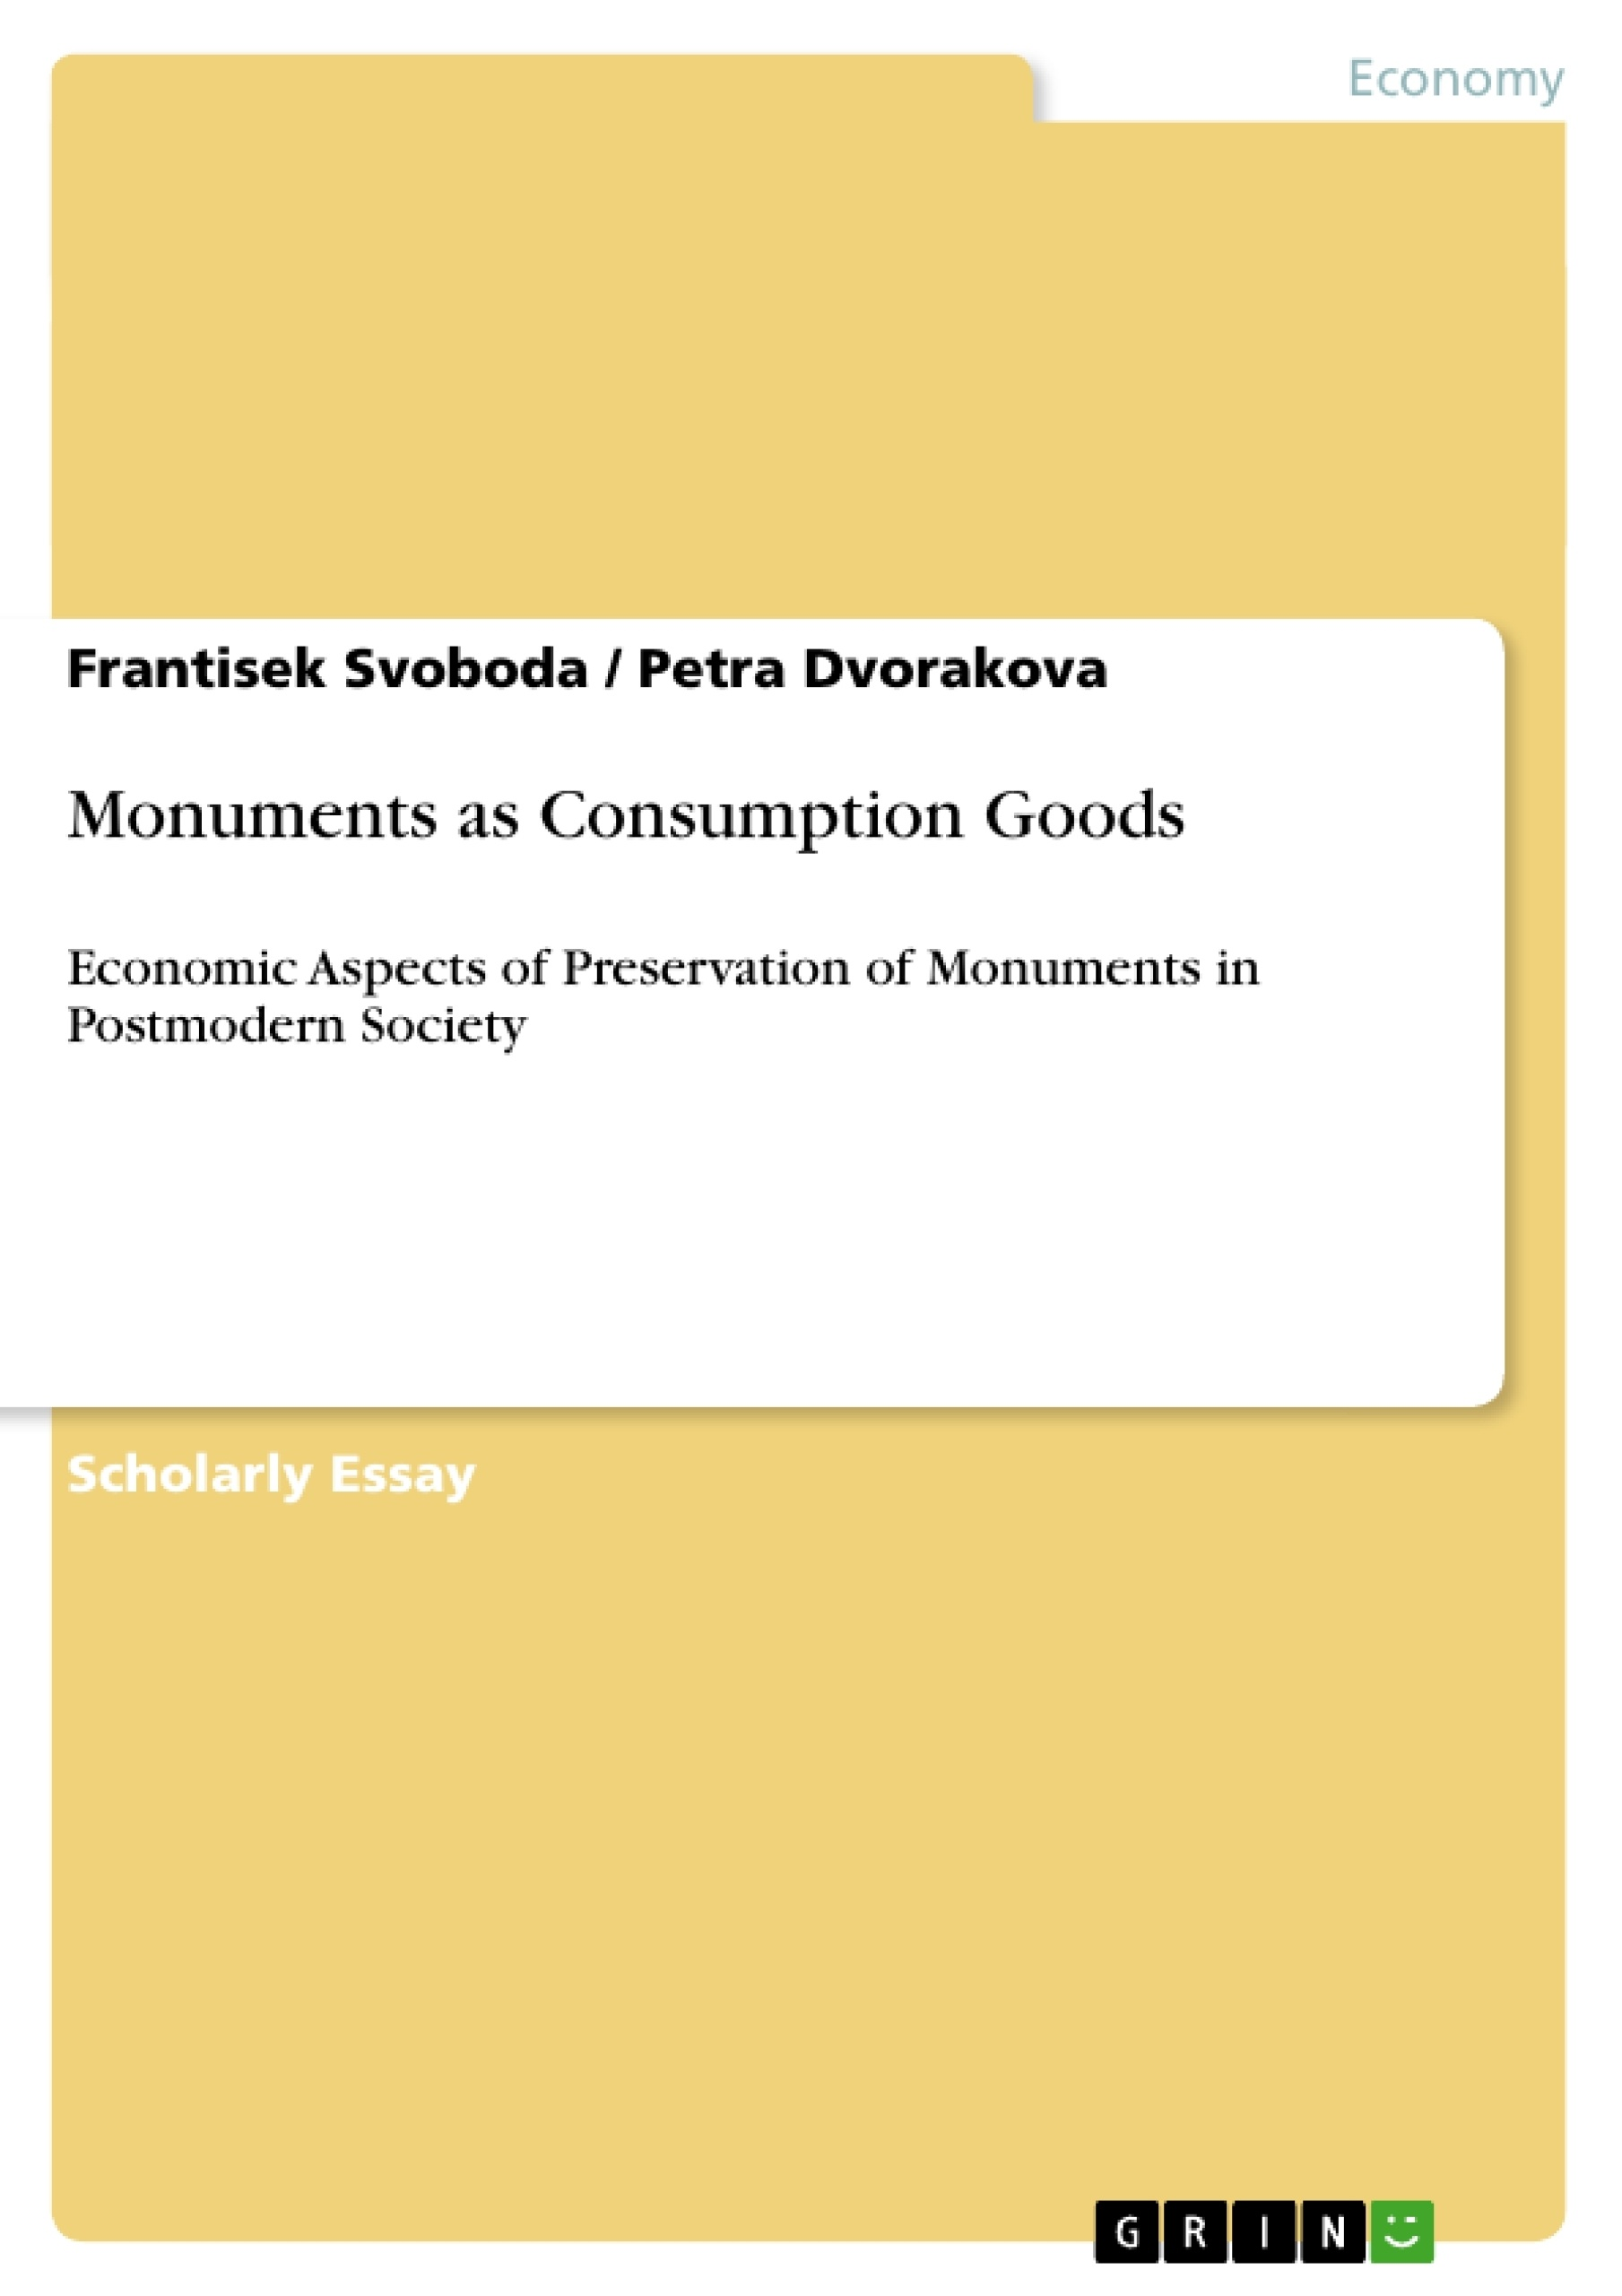 Title: Monuments as Consumption Goods